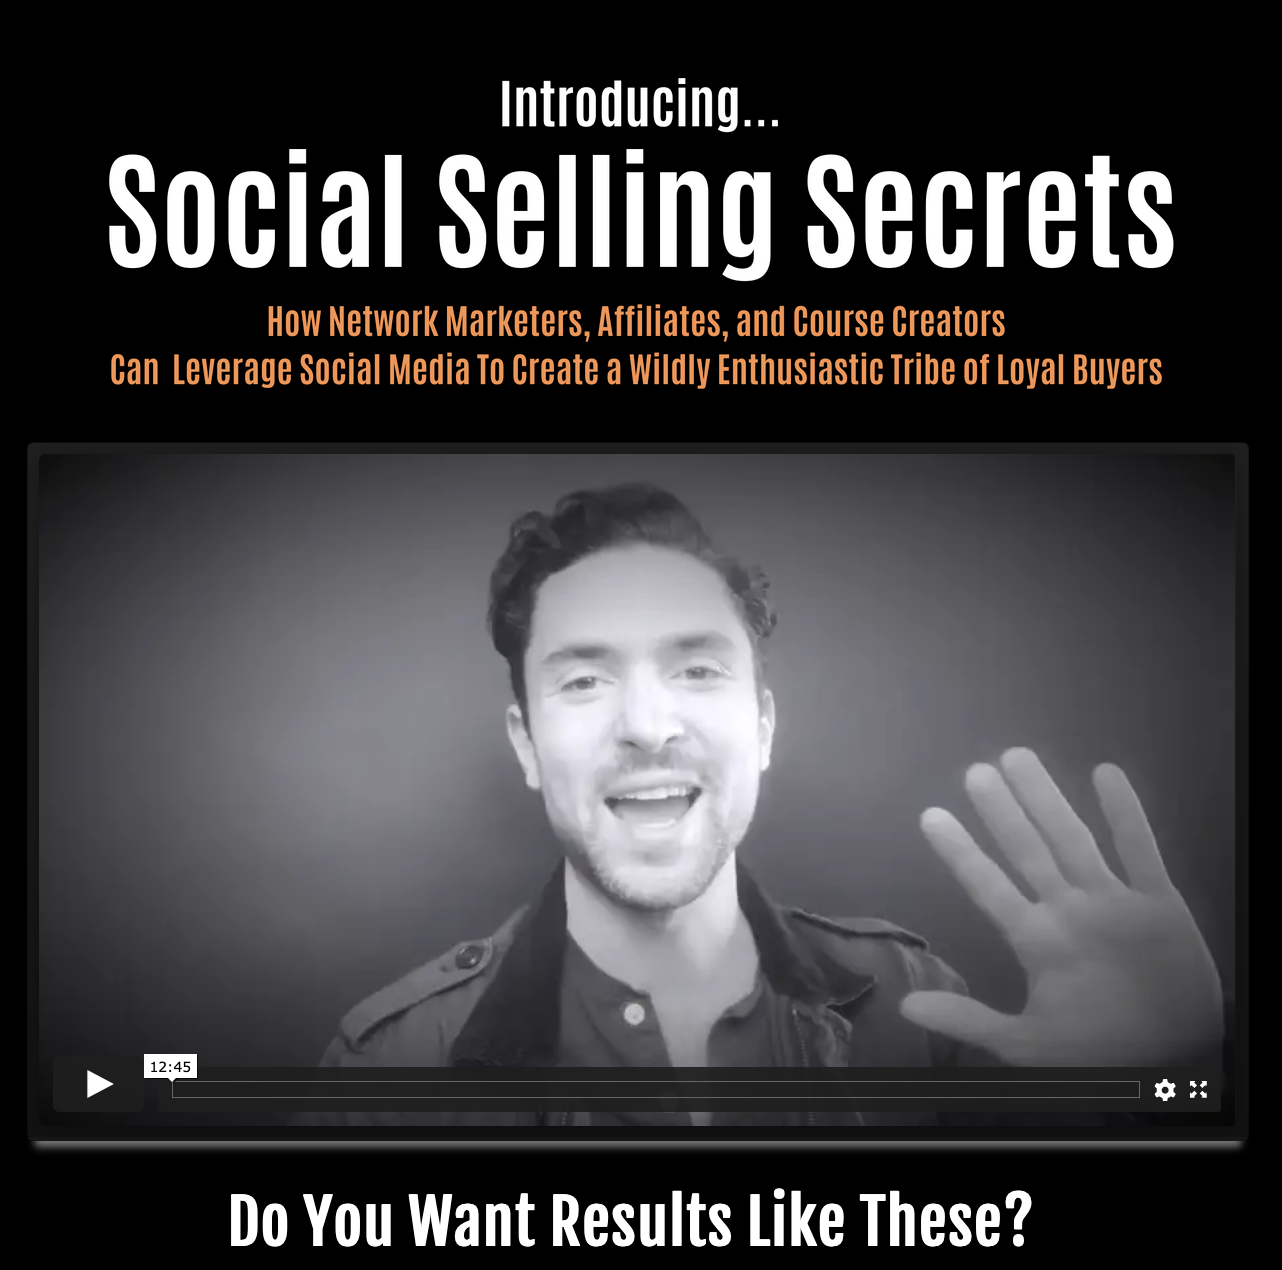 William James – Social Selling Secrets